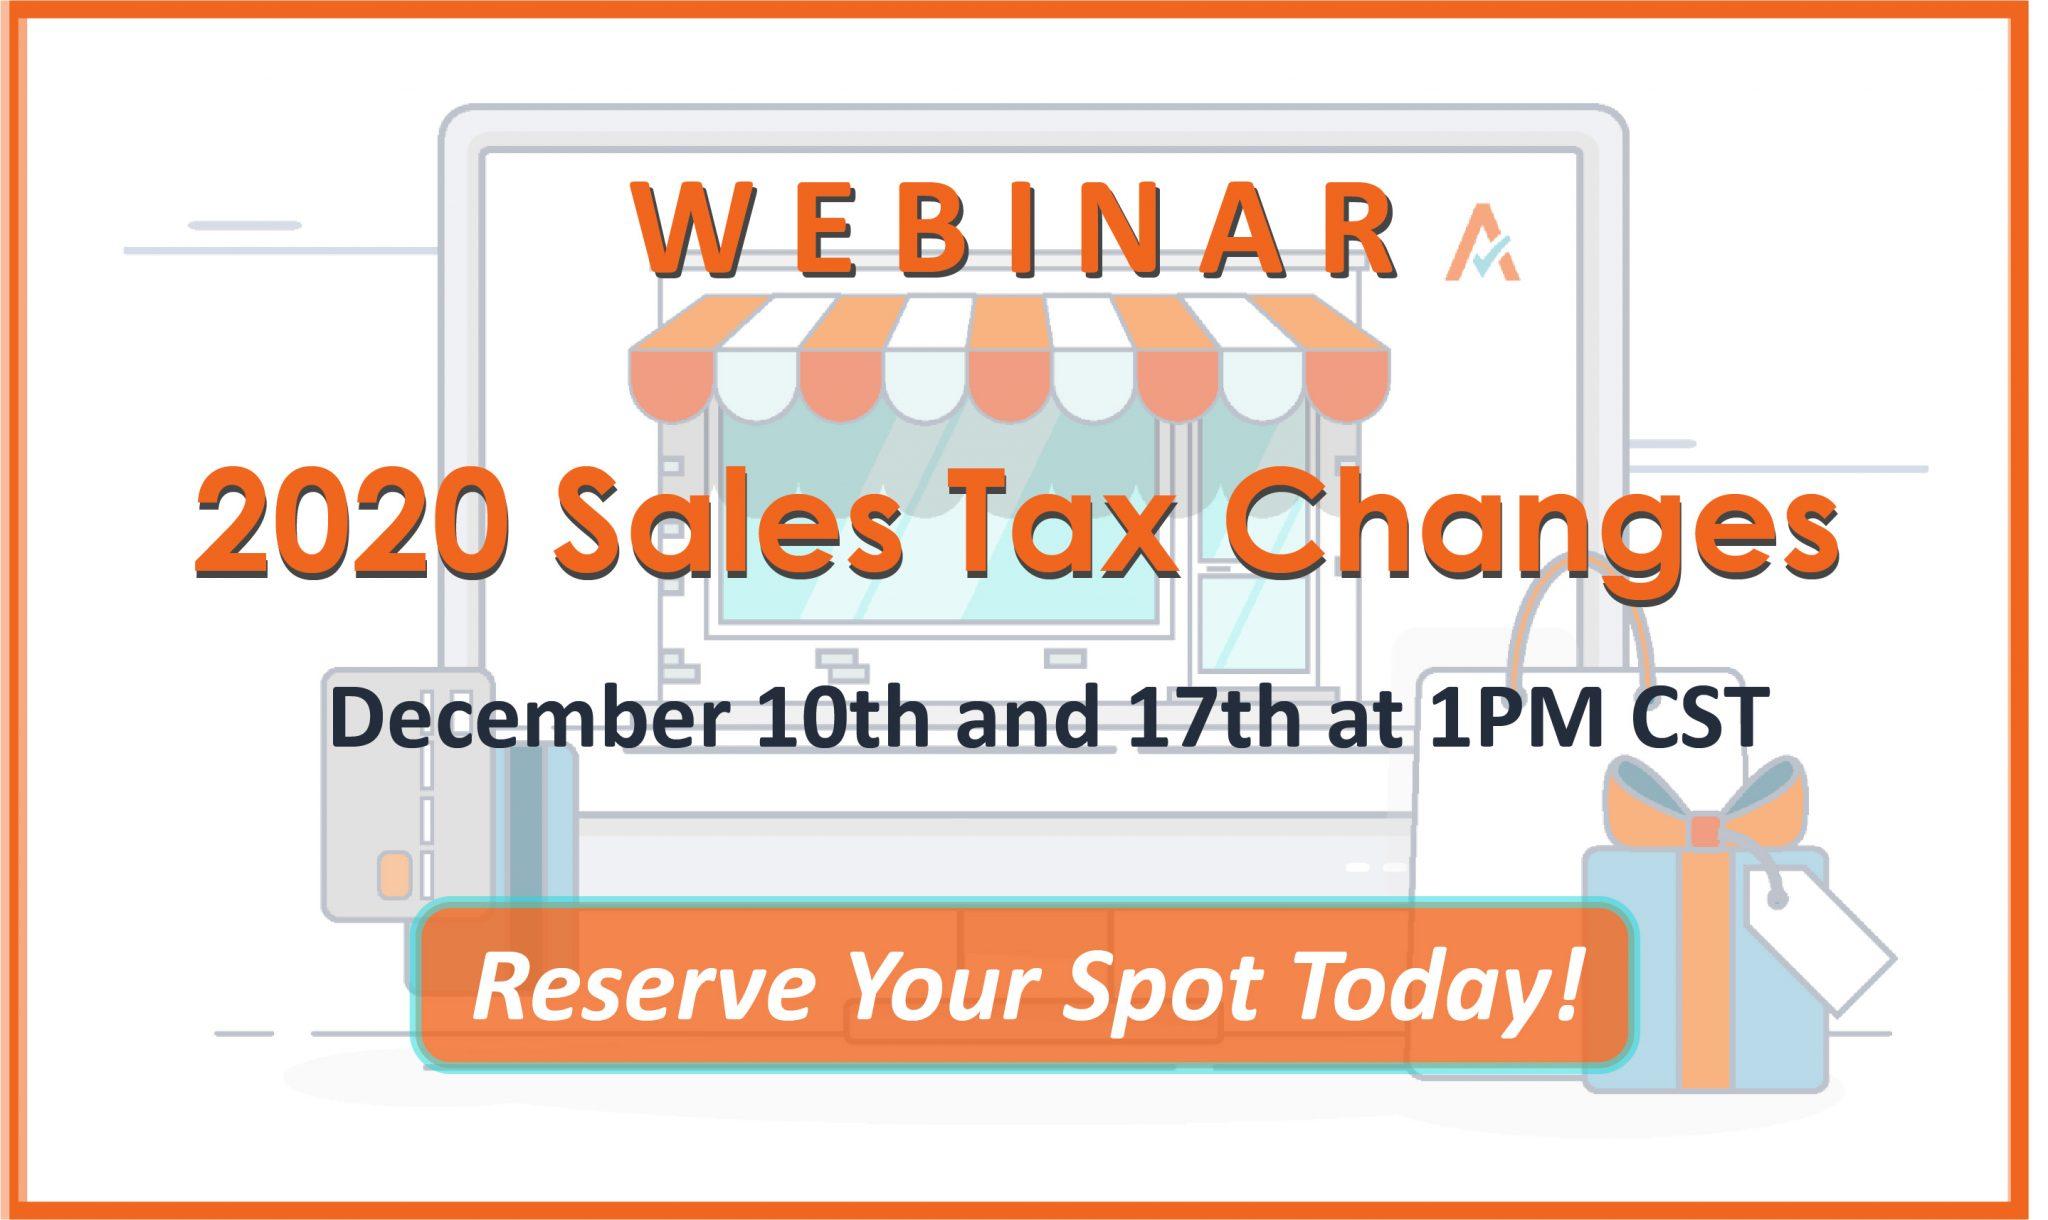 2020 Sales Tax Changes Webinar